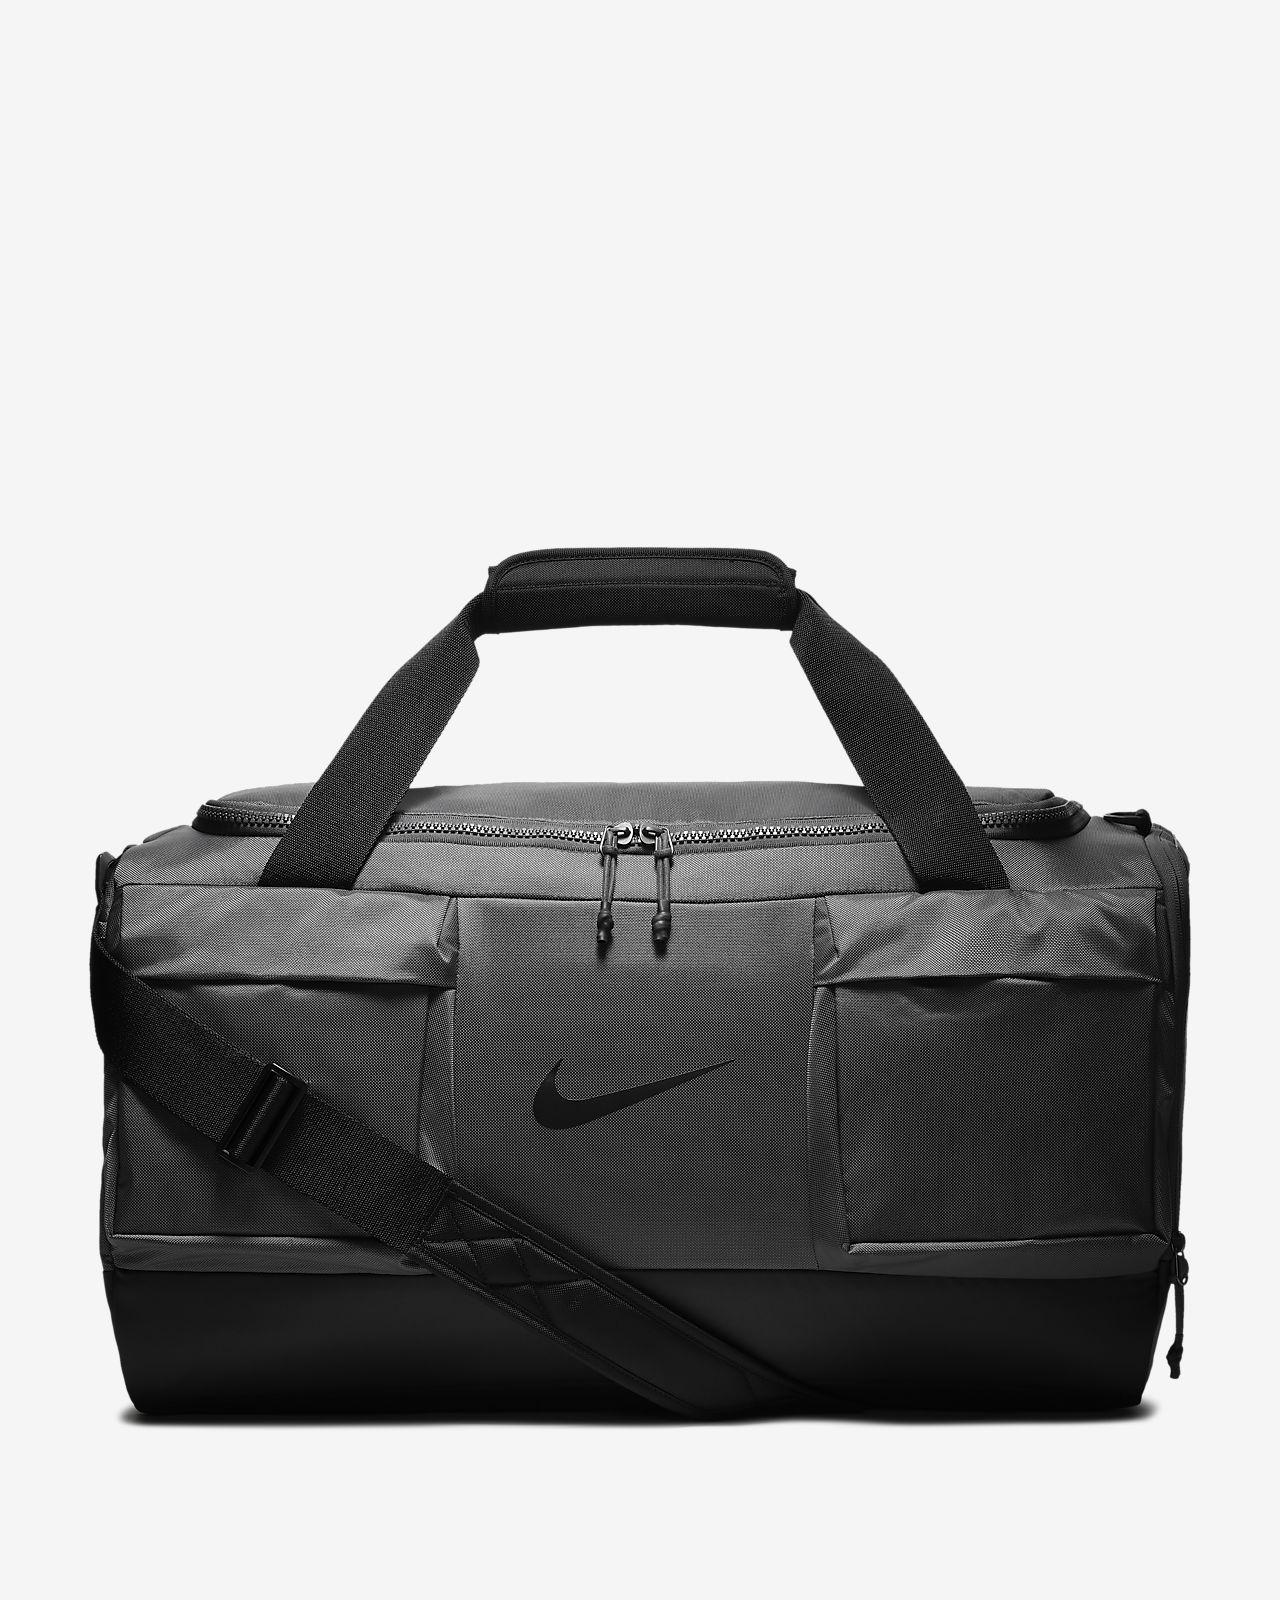 9c0f0644ea77b4 Nike Vapor Power Men's Training Duffel Bag (Medium). Nike.com